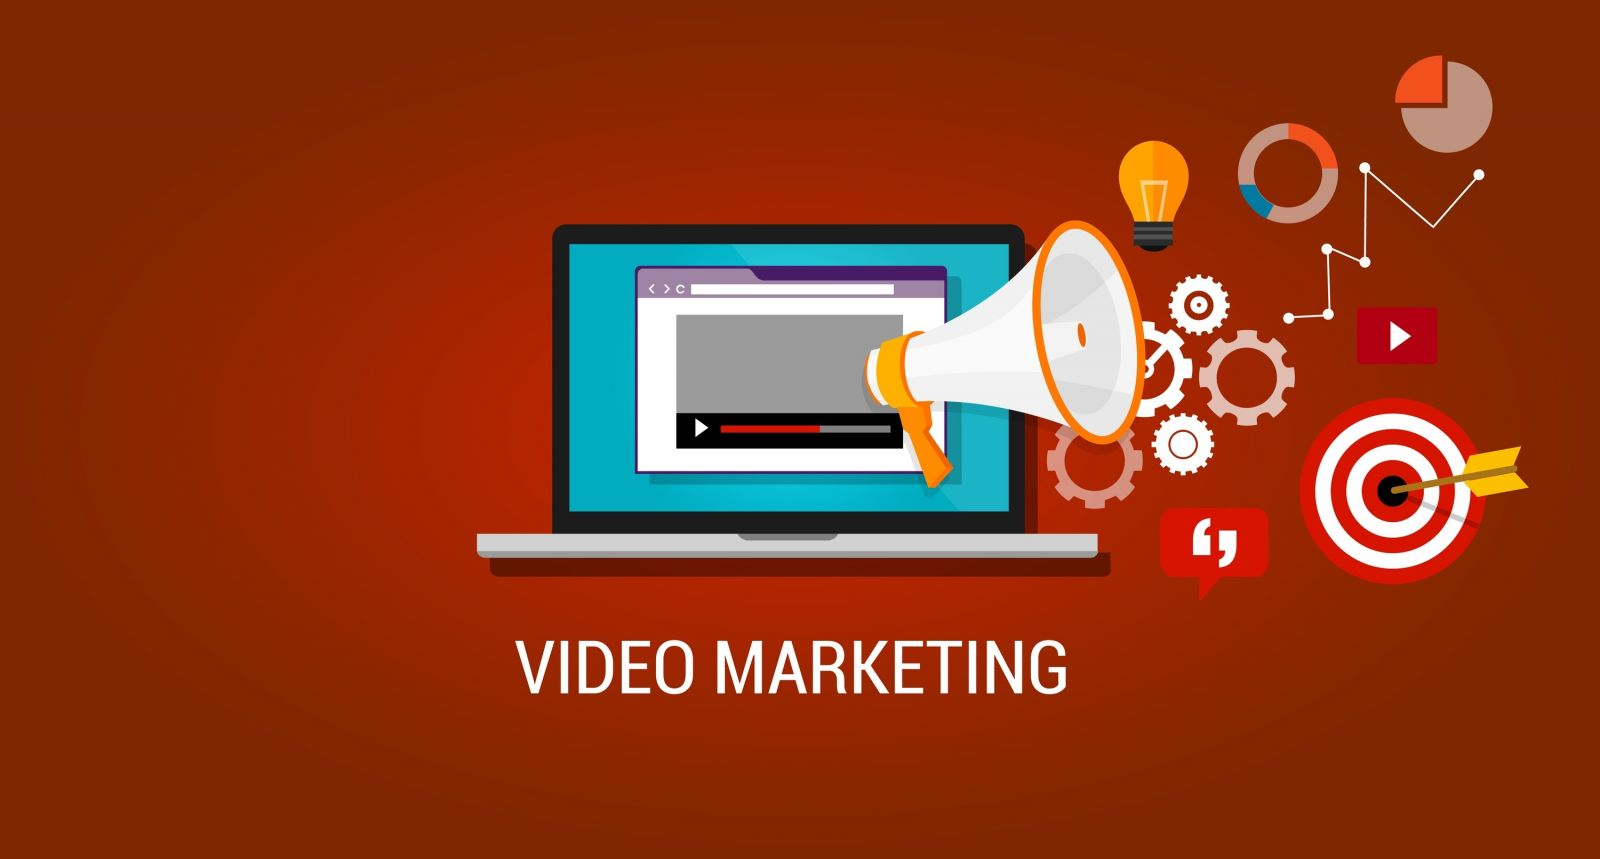 digital-video-xu-huong-marketing-online-noi-troi-hien-nay